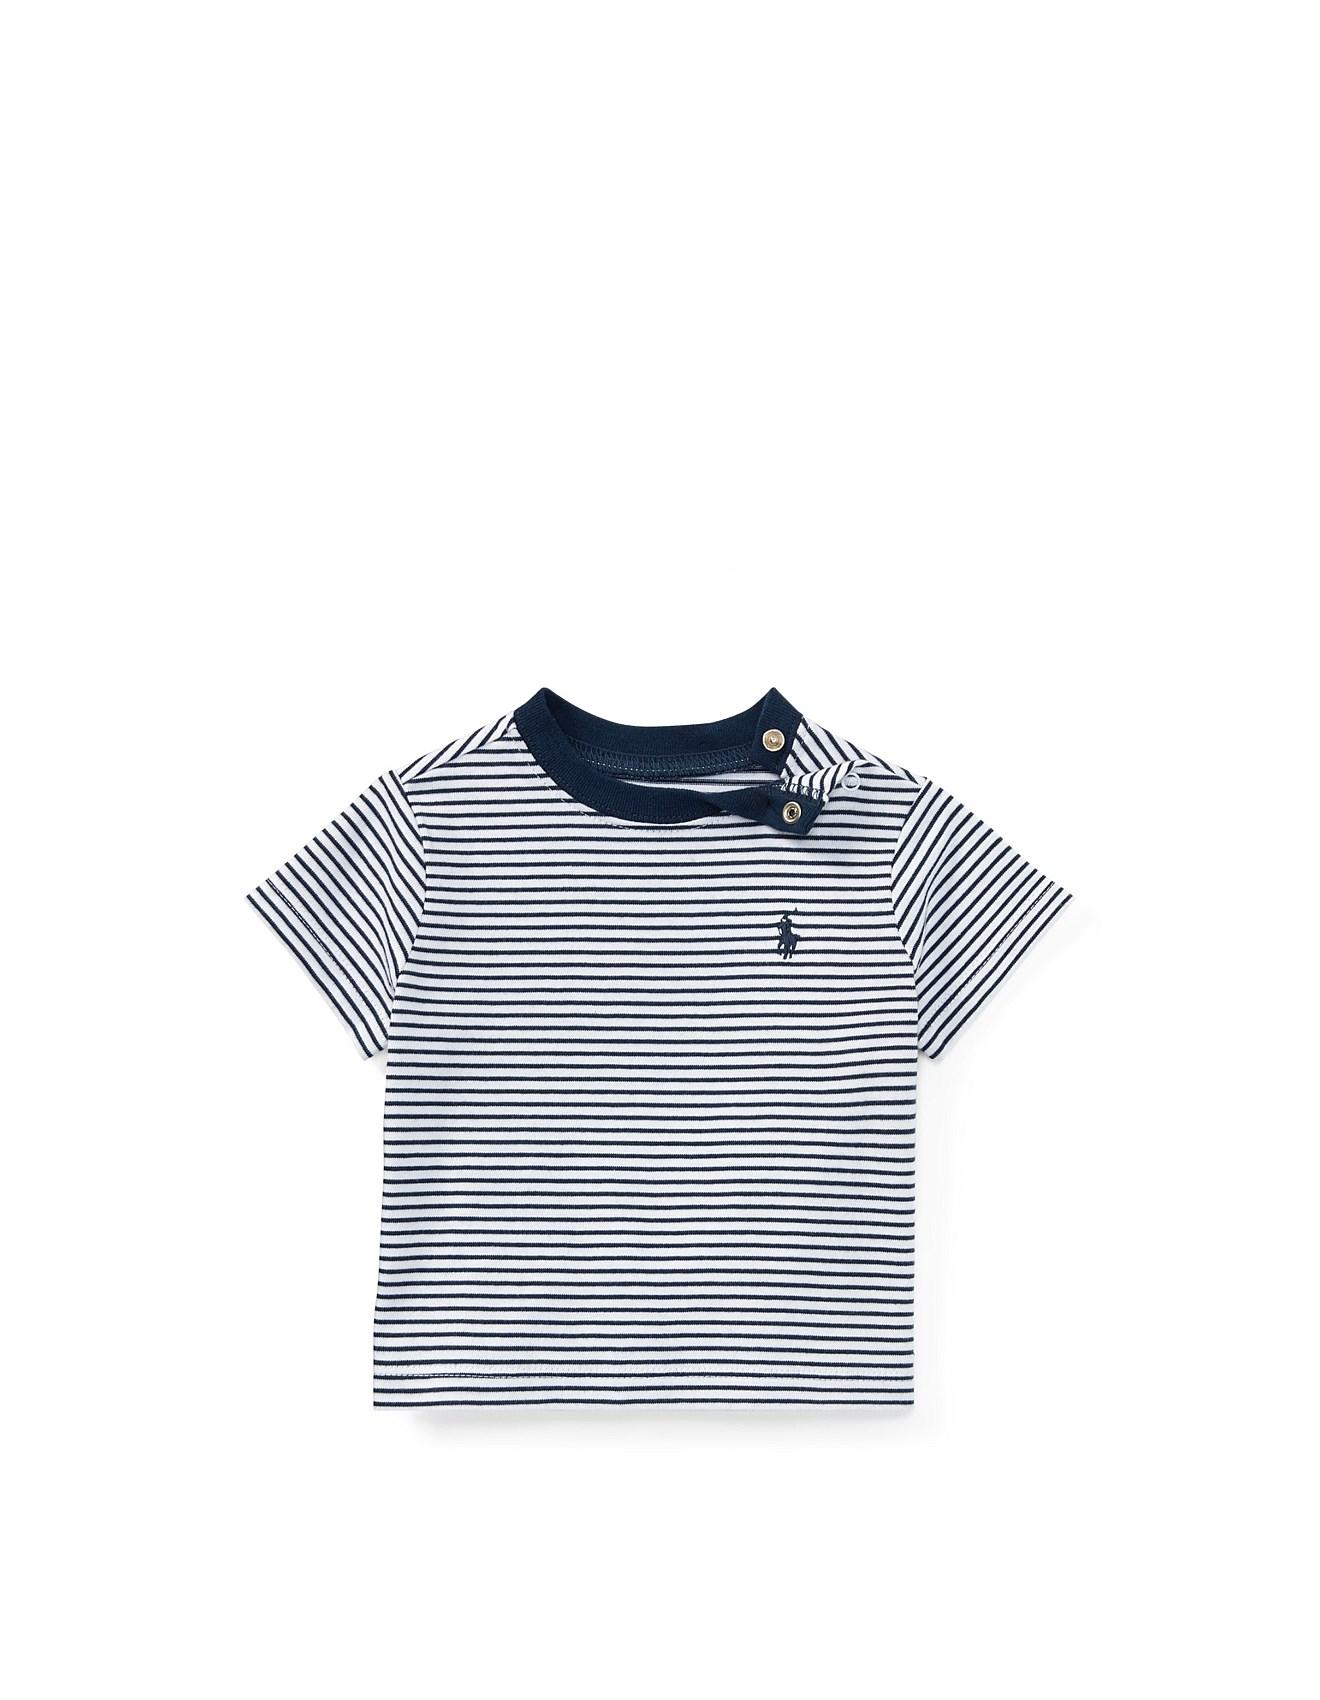 c278c6b98 Striped Cotton Jersey T-Shirt(3-24 Months). 1  2. Zoom. Polo Ralph Lauren